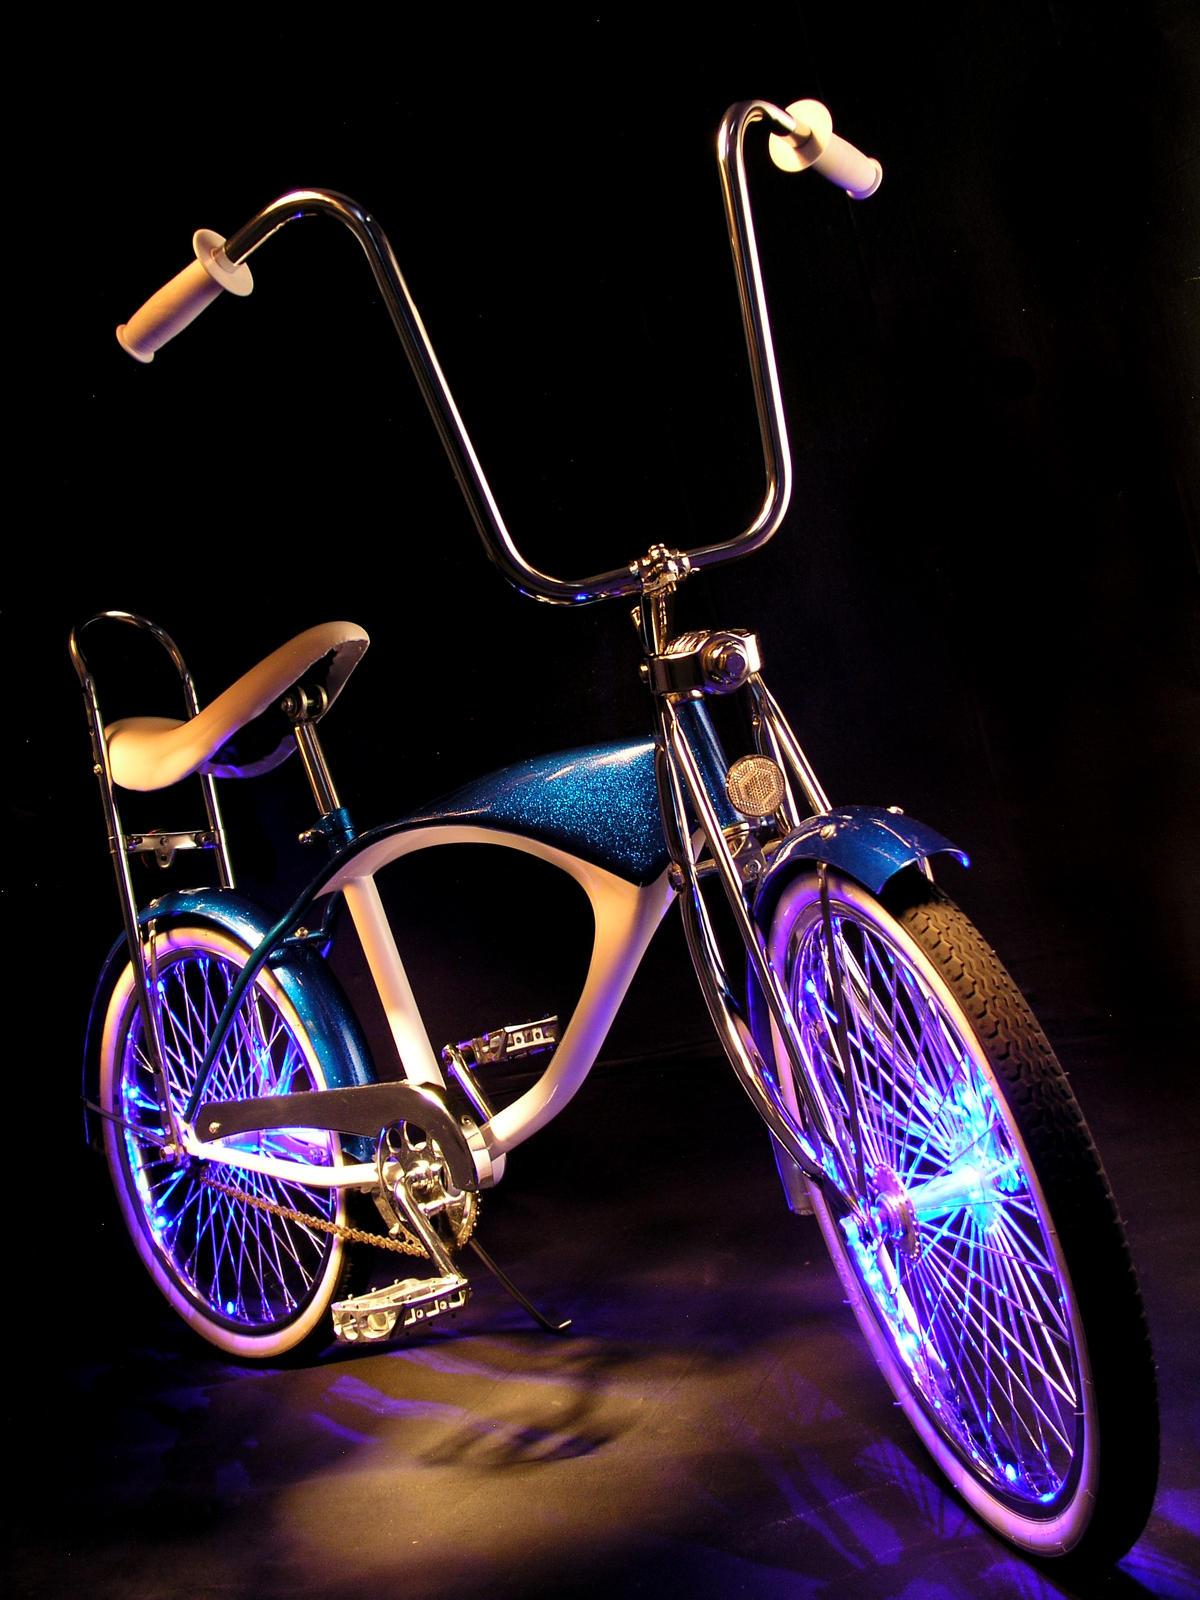 Blue Bike 2 by caesar1996